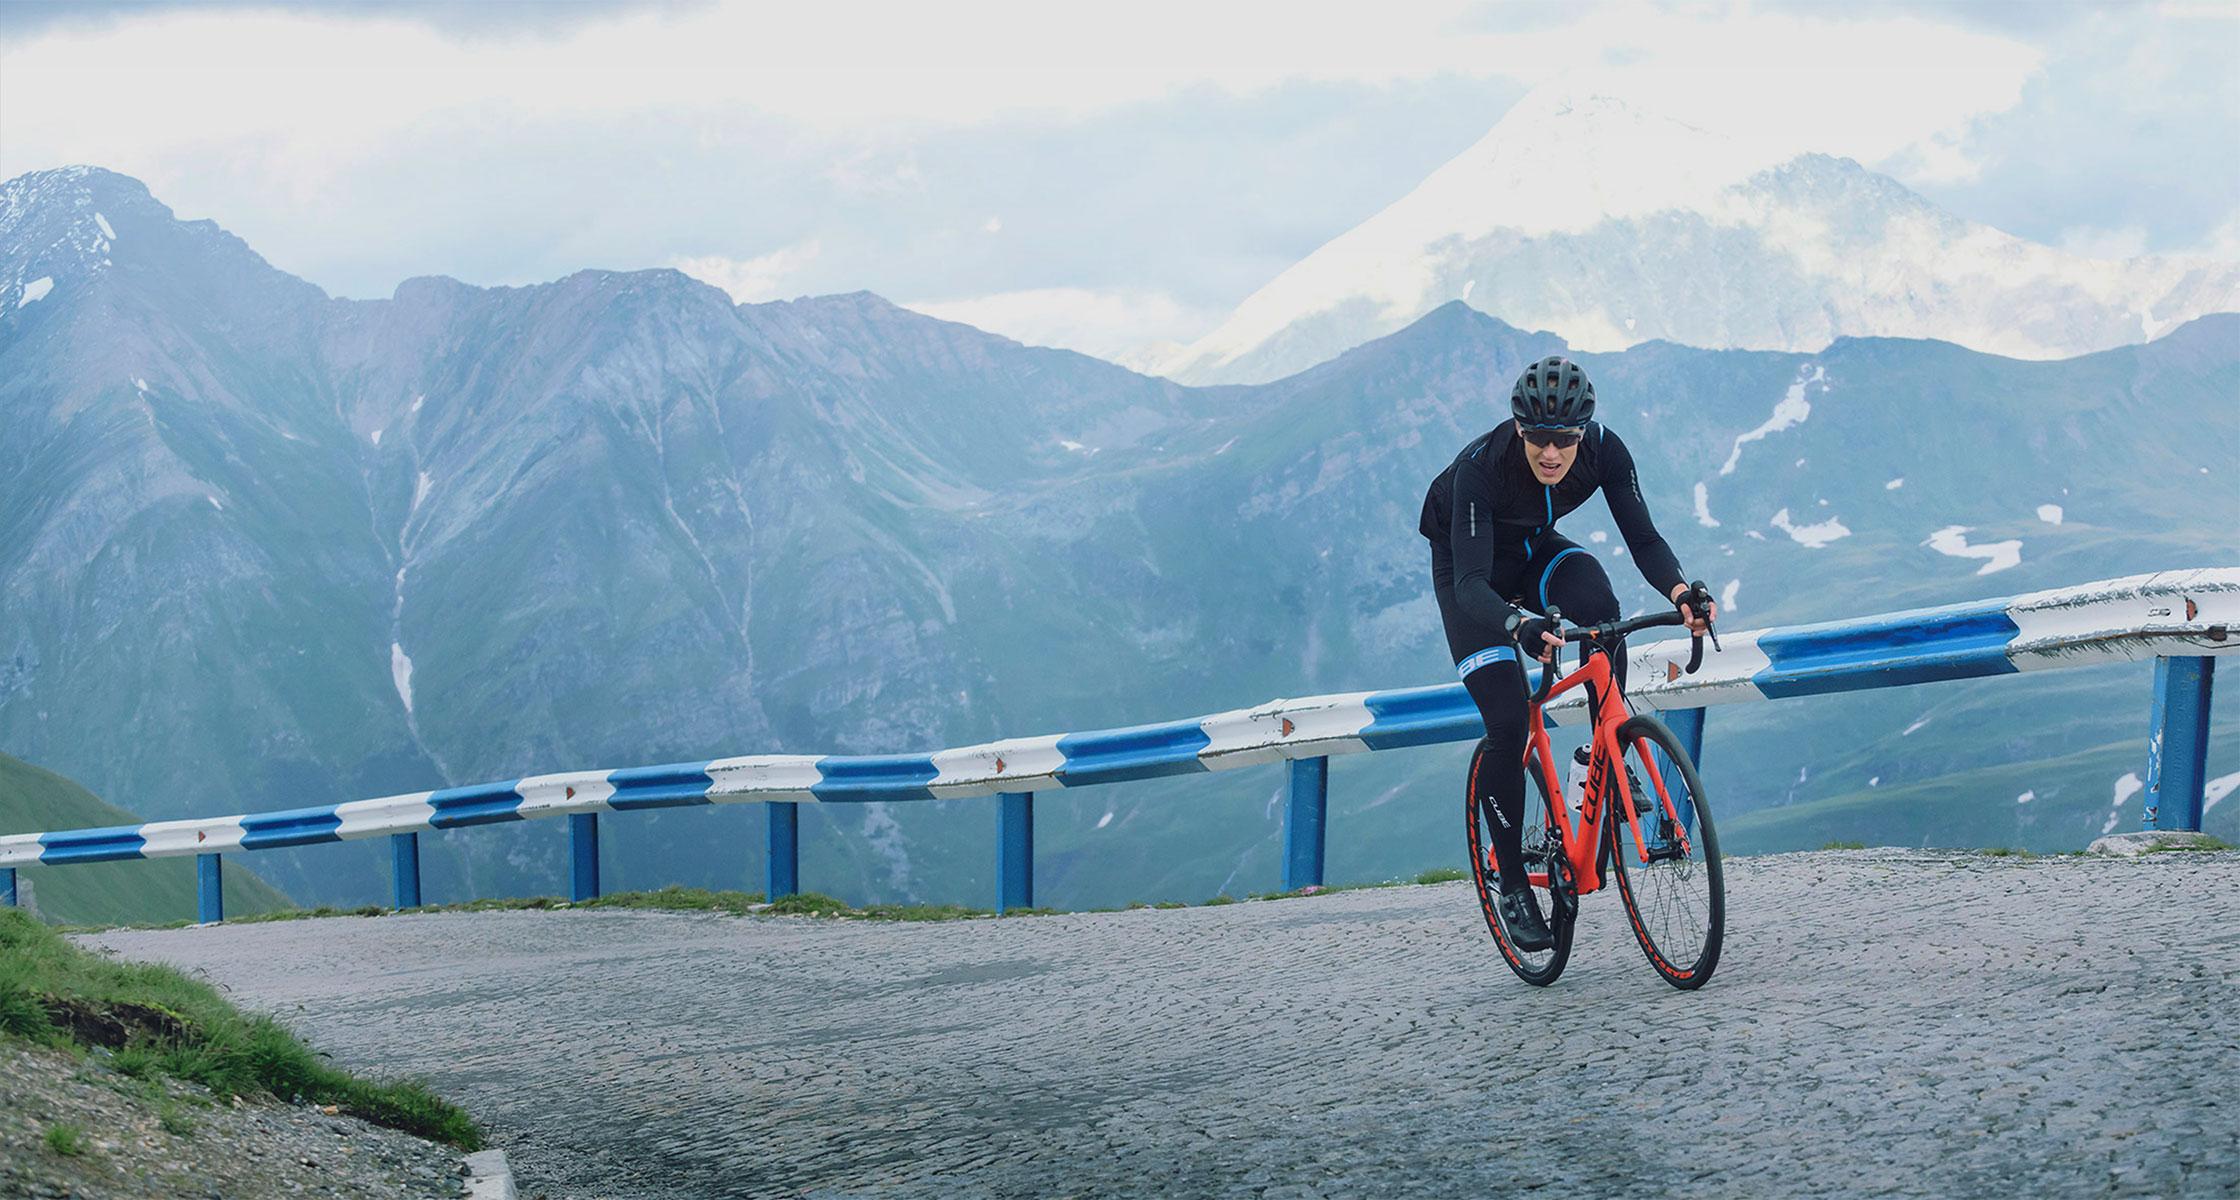 Finde Dein Fahrrad - Ob Mountainbike oder E-Bike